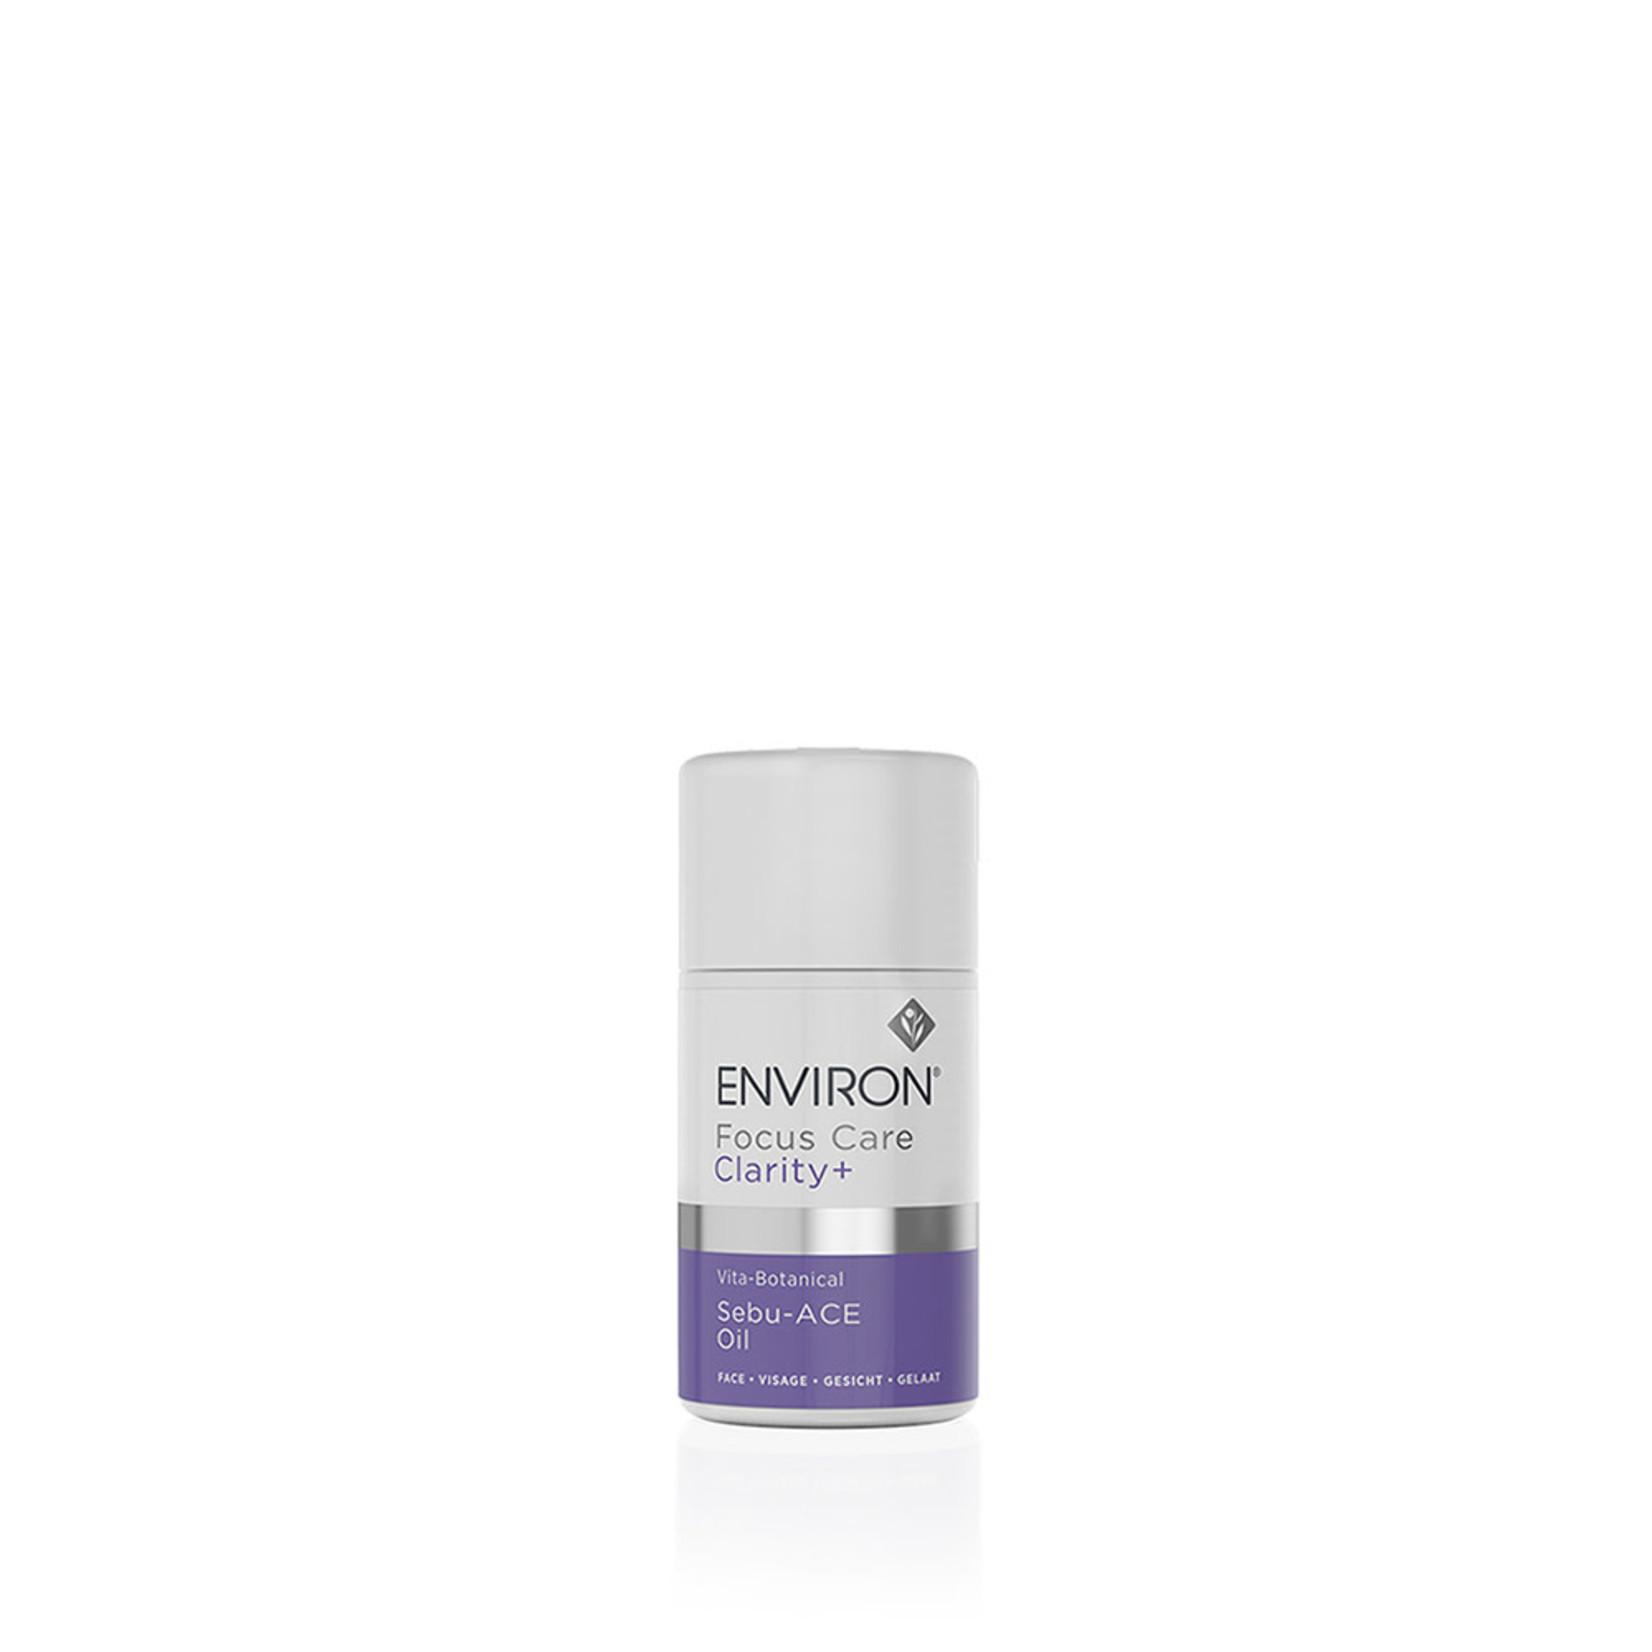 Environ Vita-botanical sebu -ACE oil 60ml